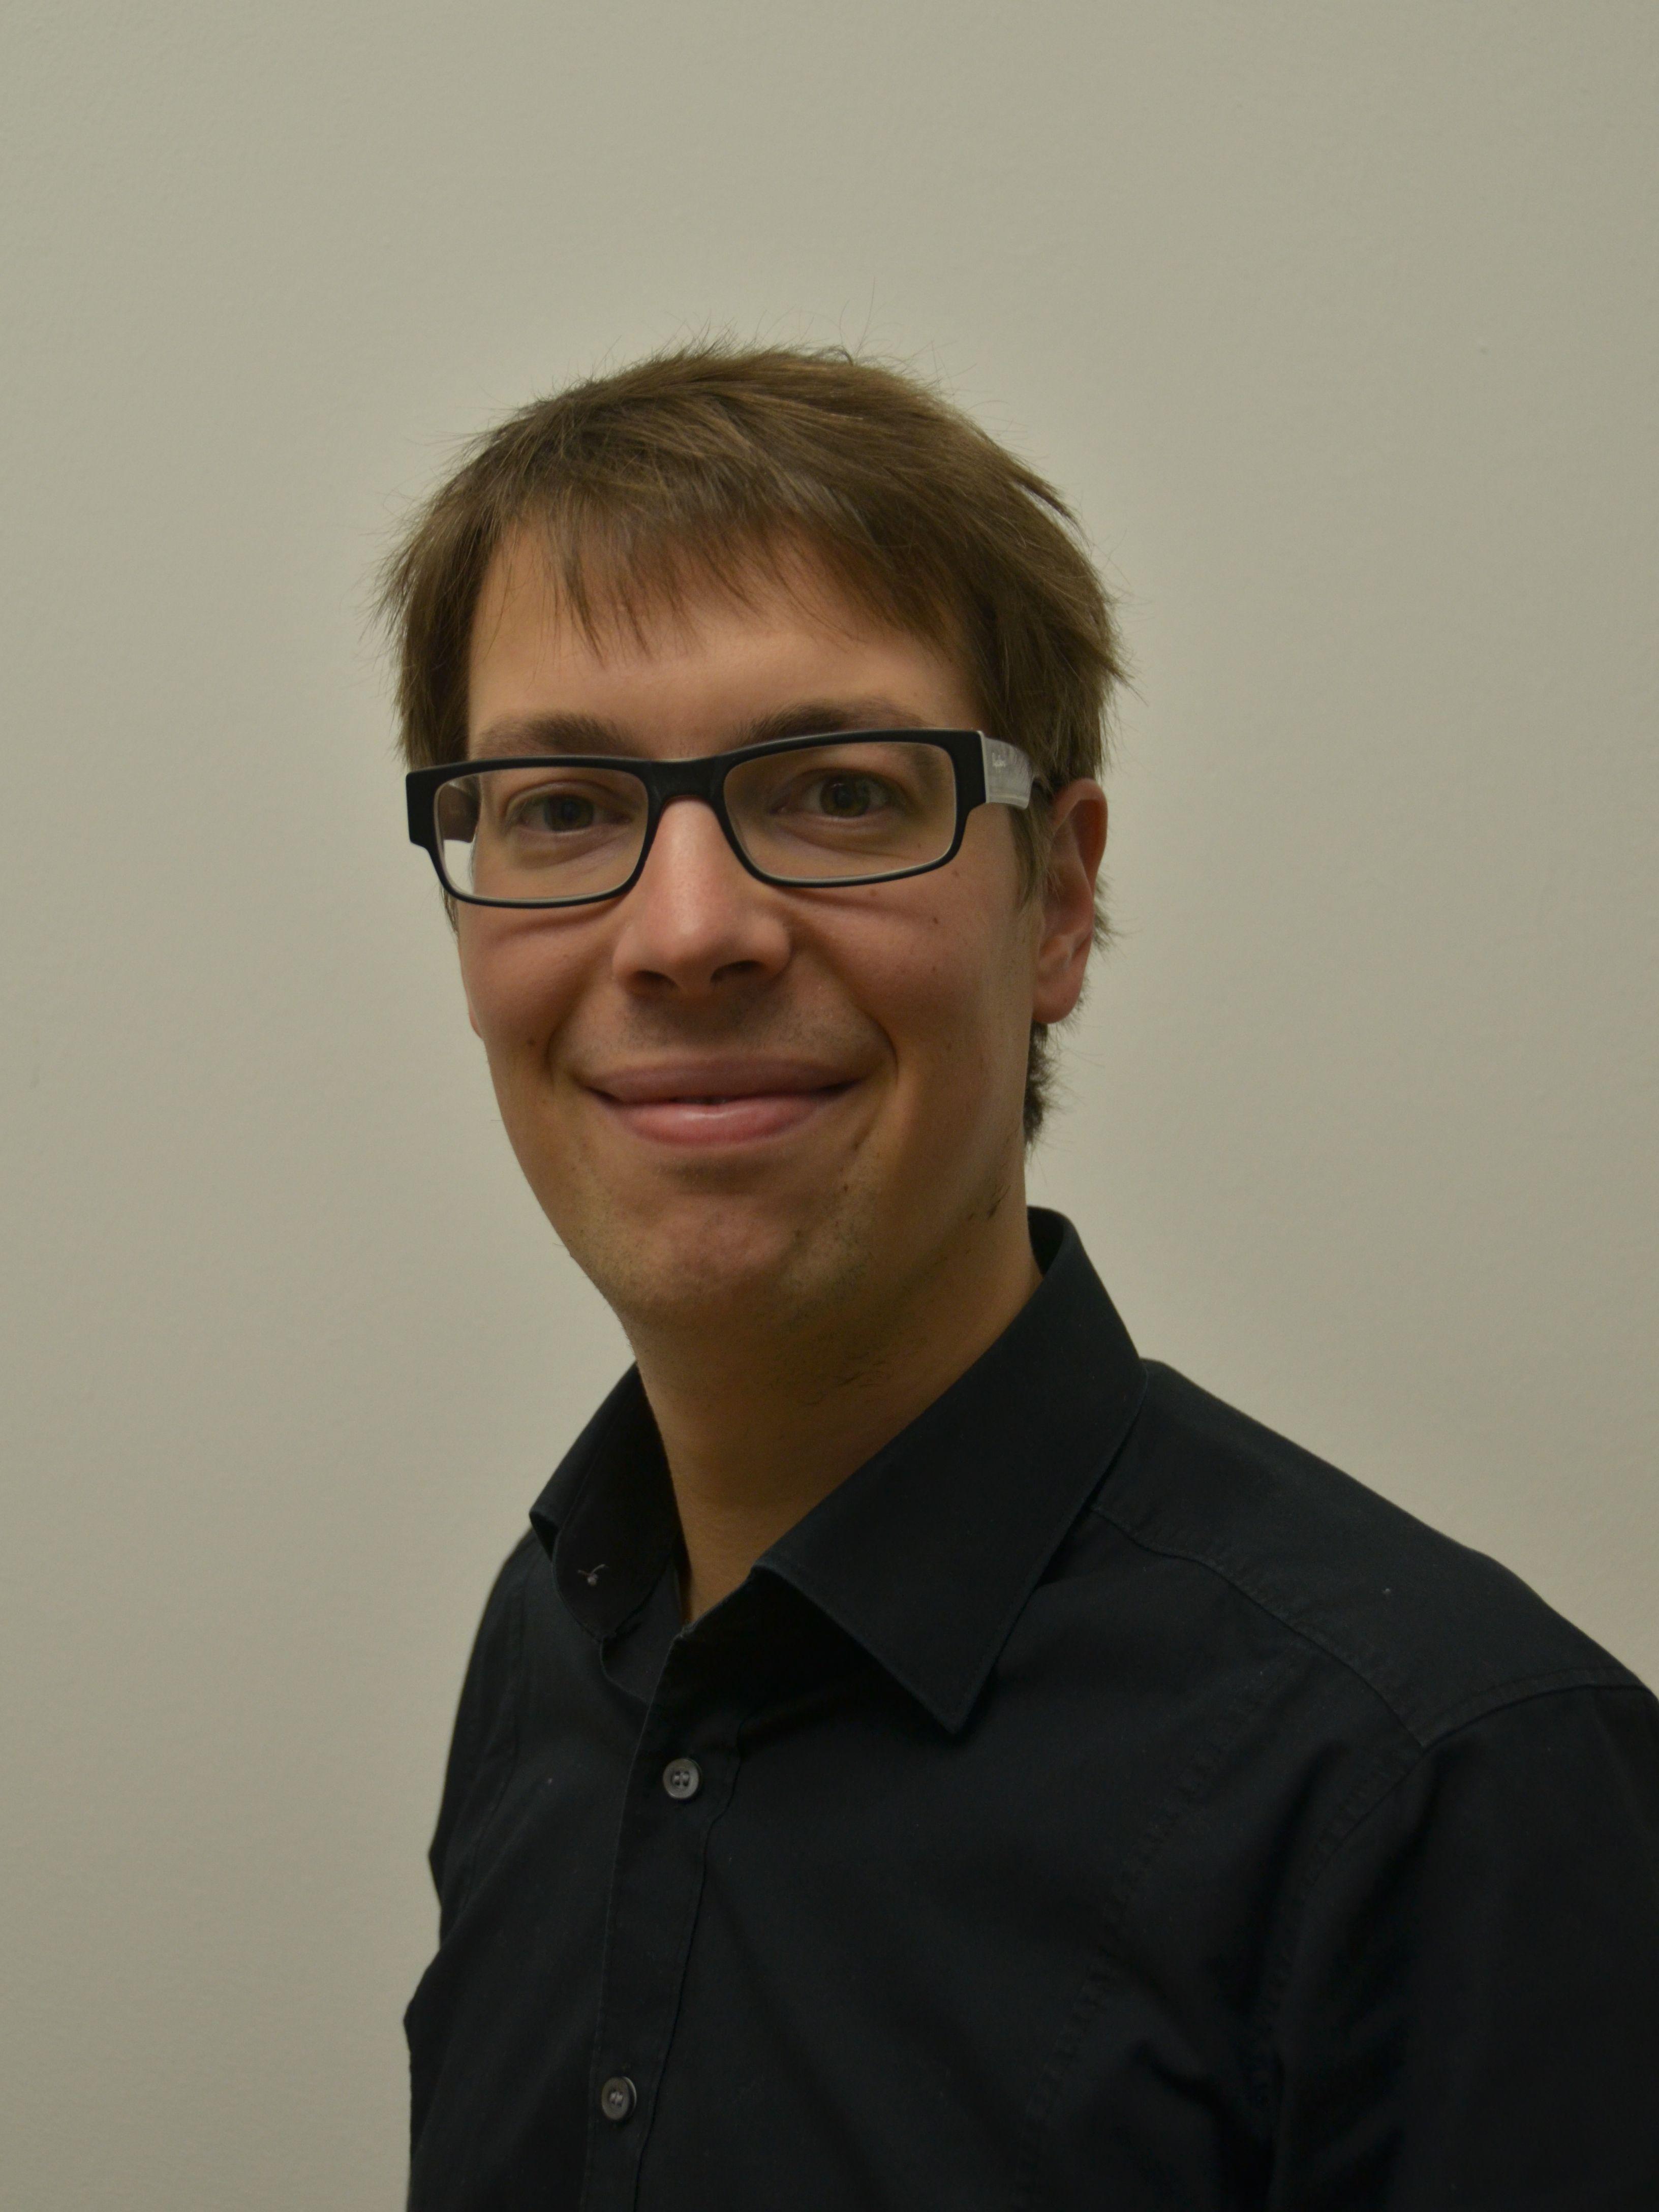 M.A. Michael Offermann